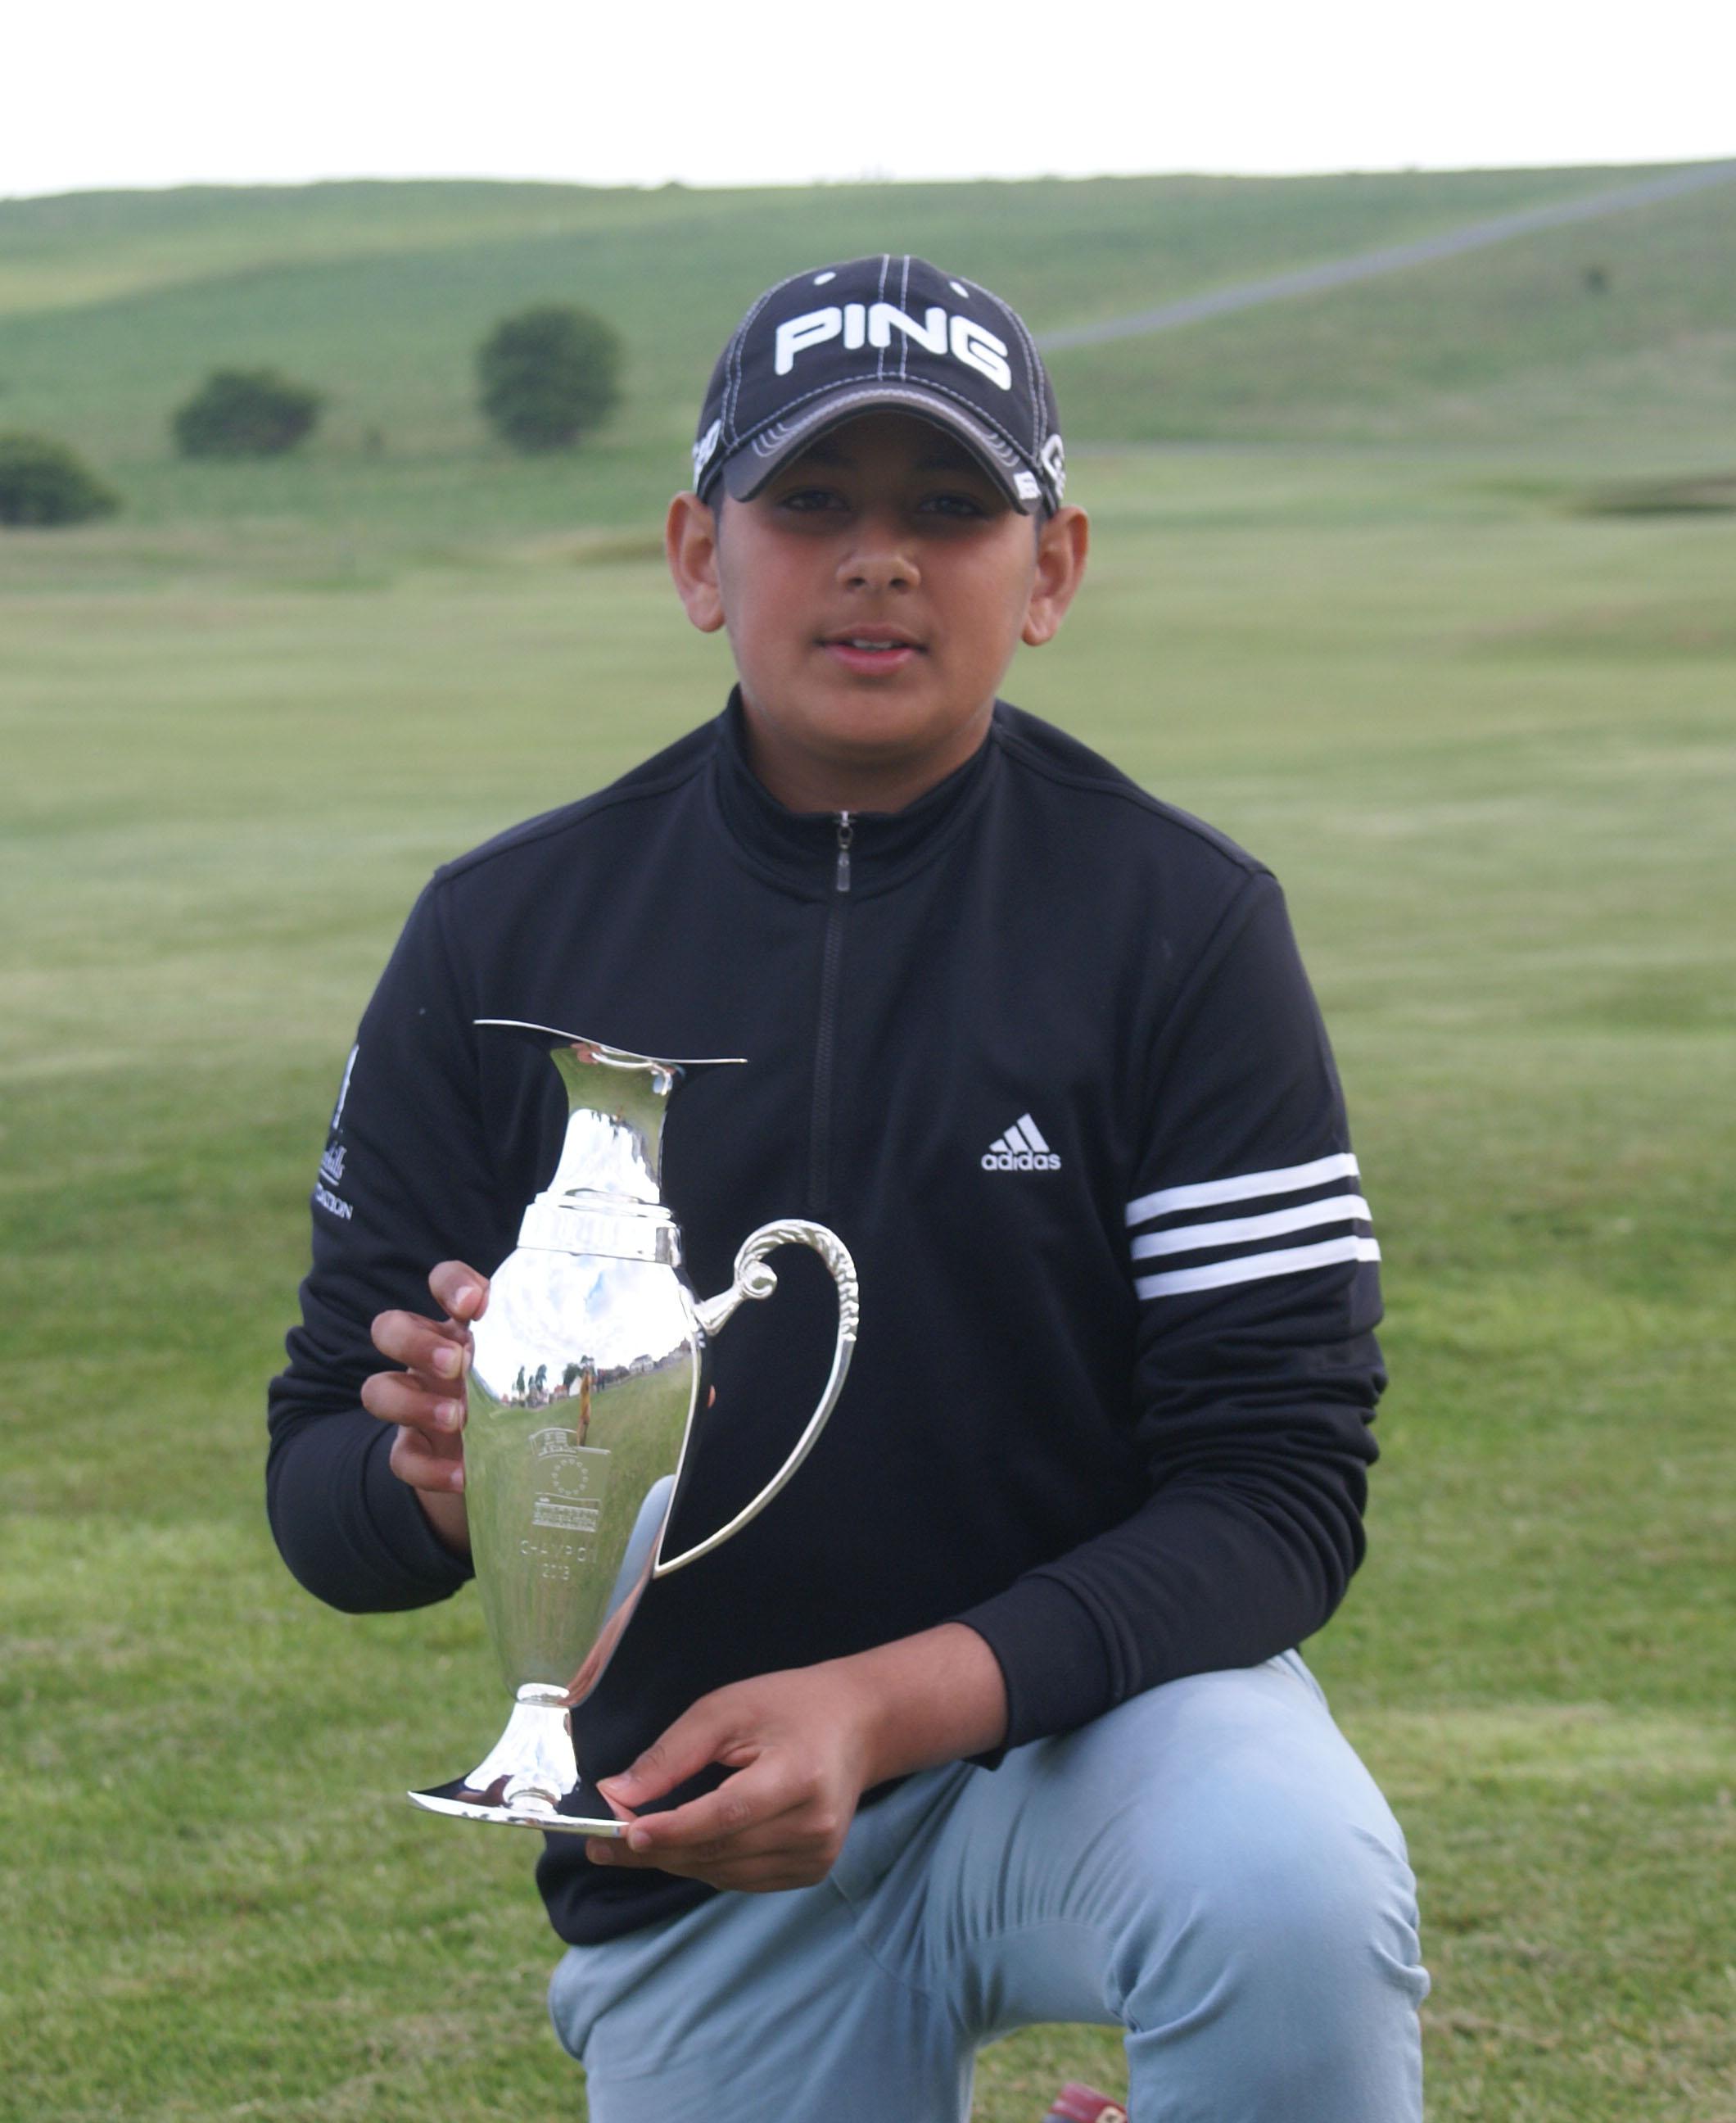 Aadam Syed, two time Junior European Golf Championship winner